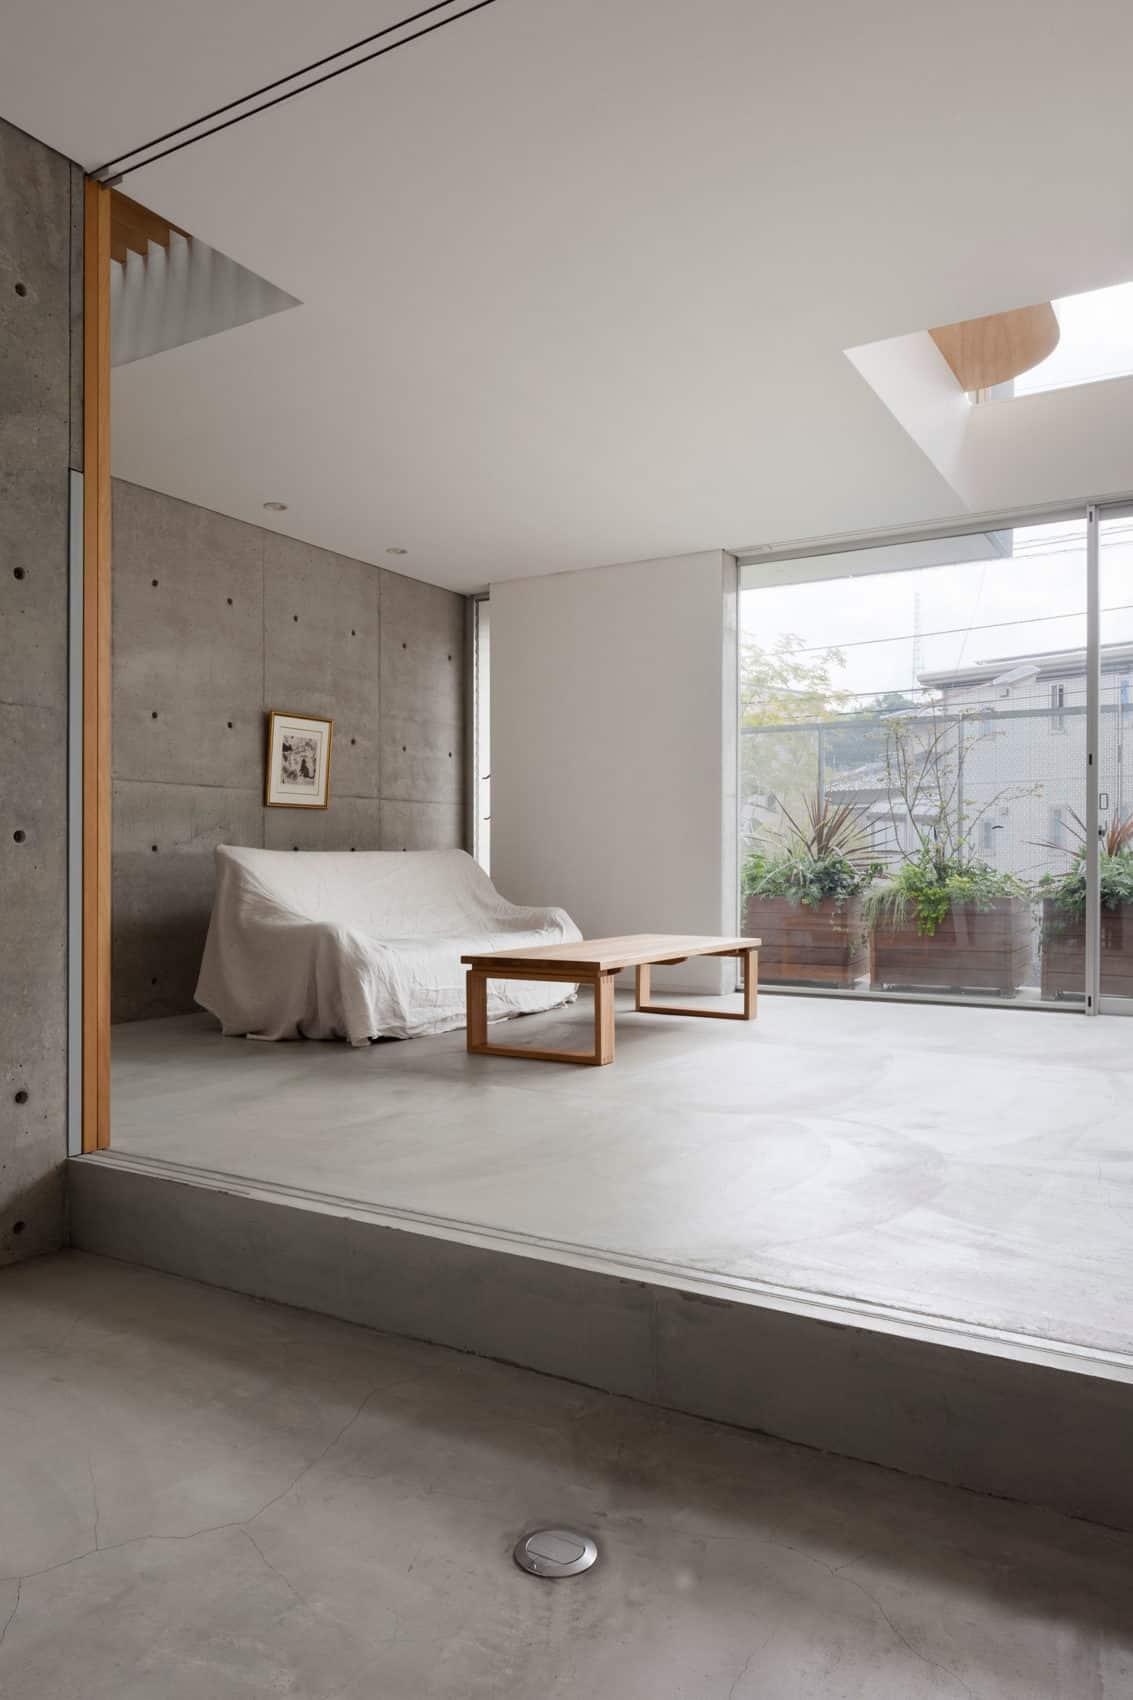 House in Midorigaoka by Yutaka Yoshida Architect (4)